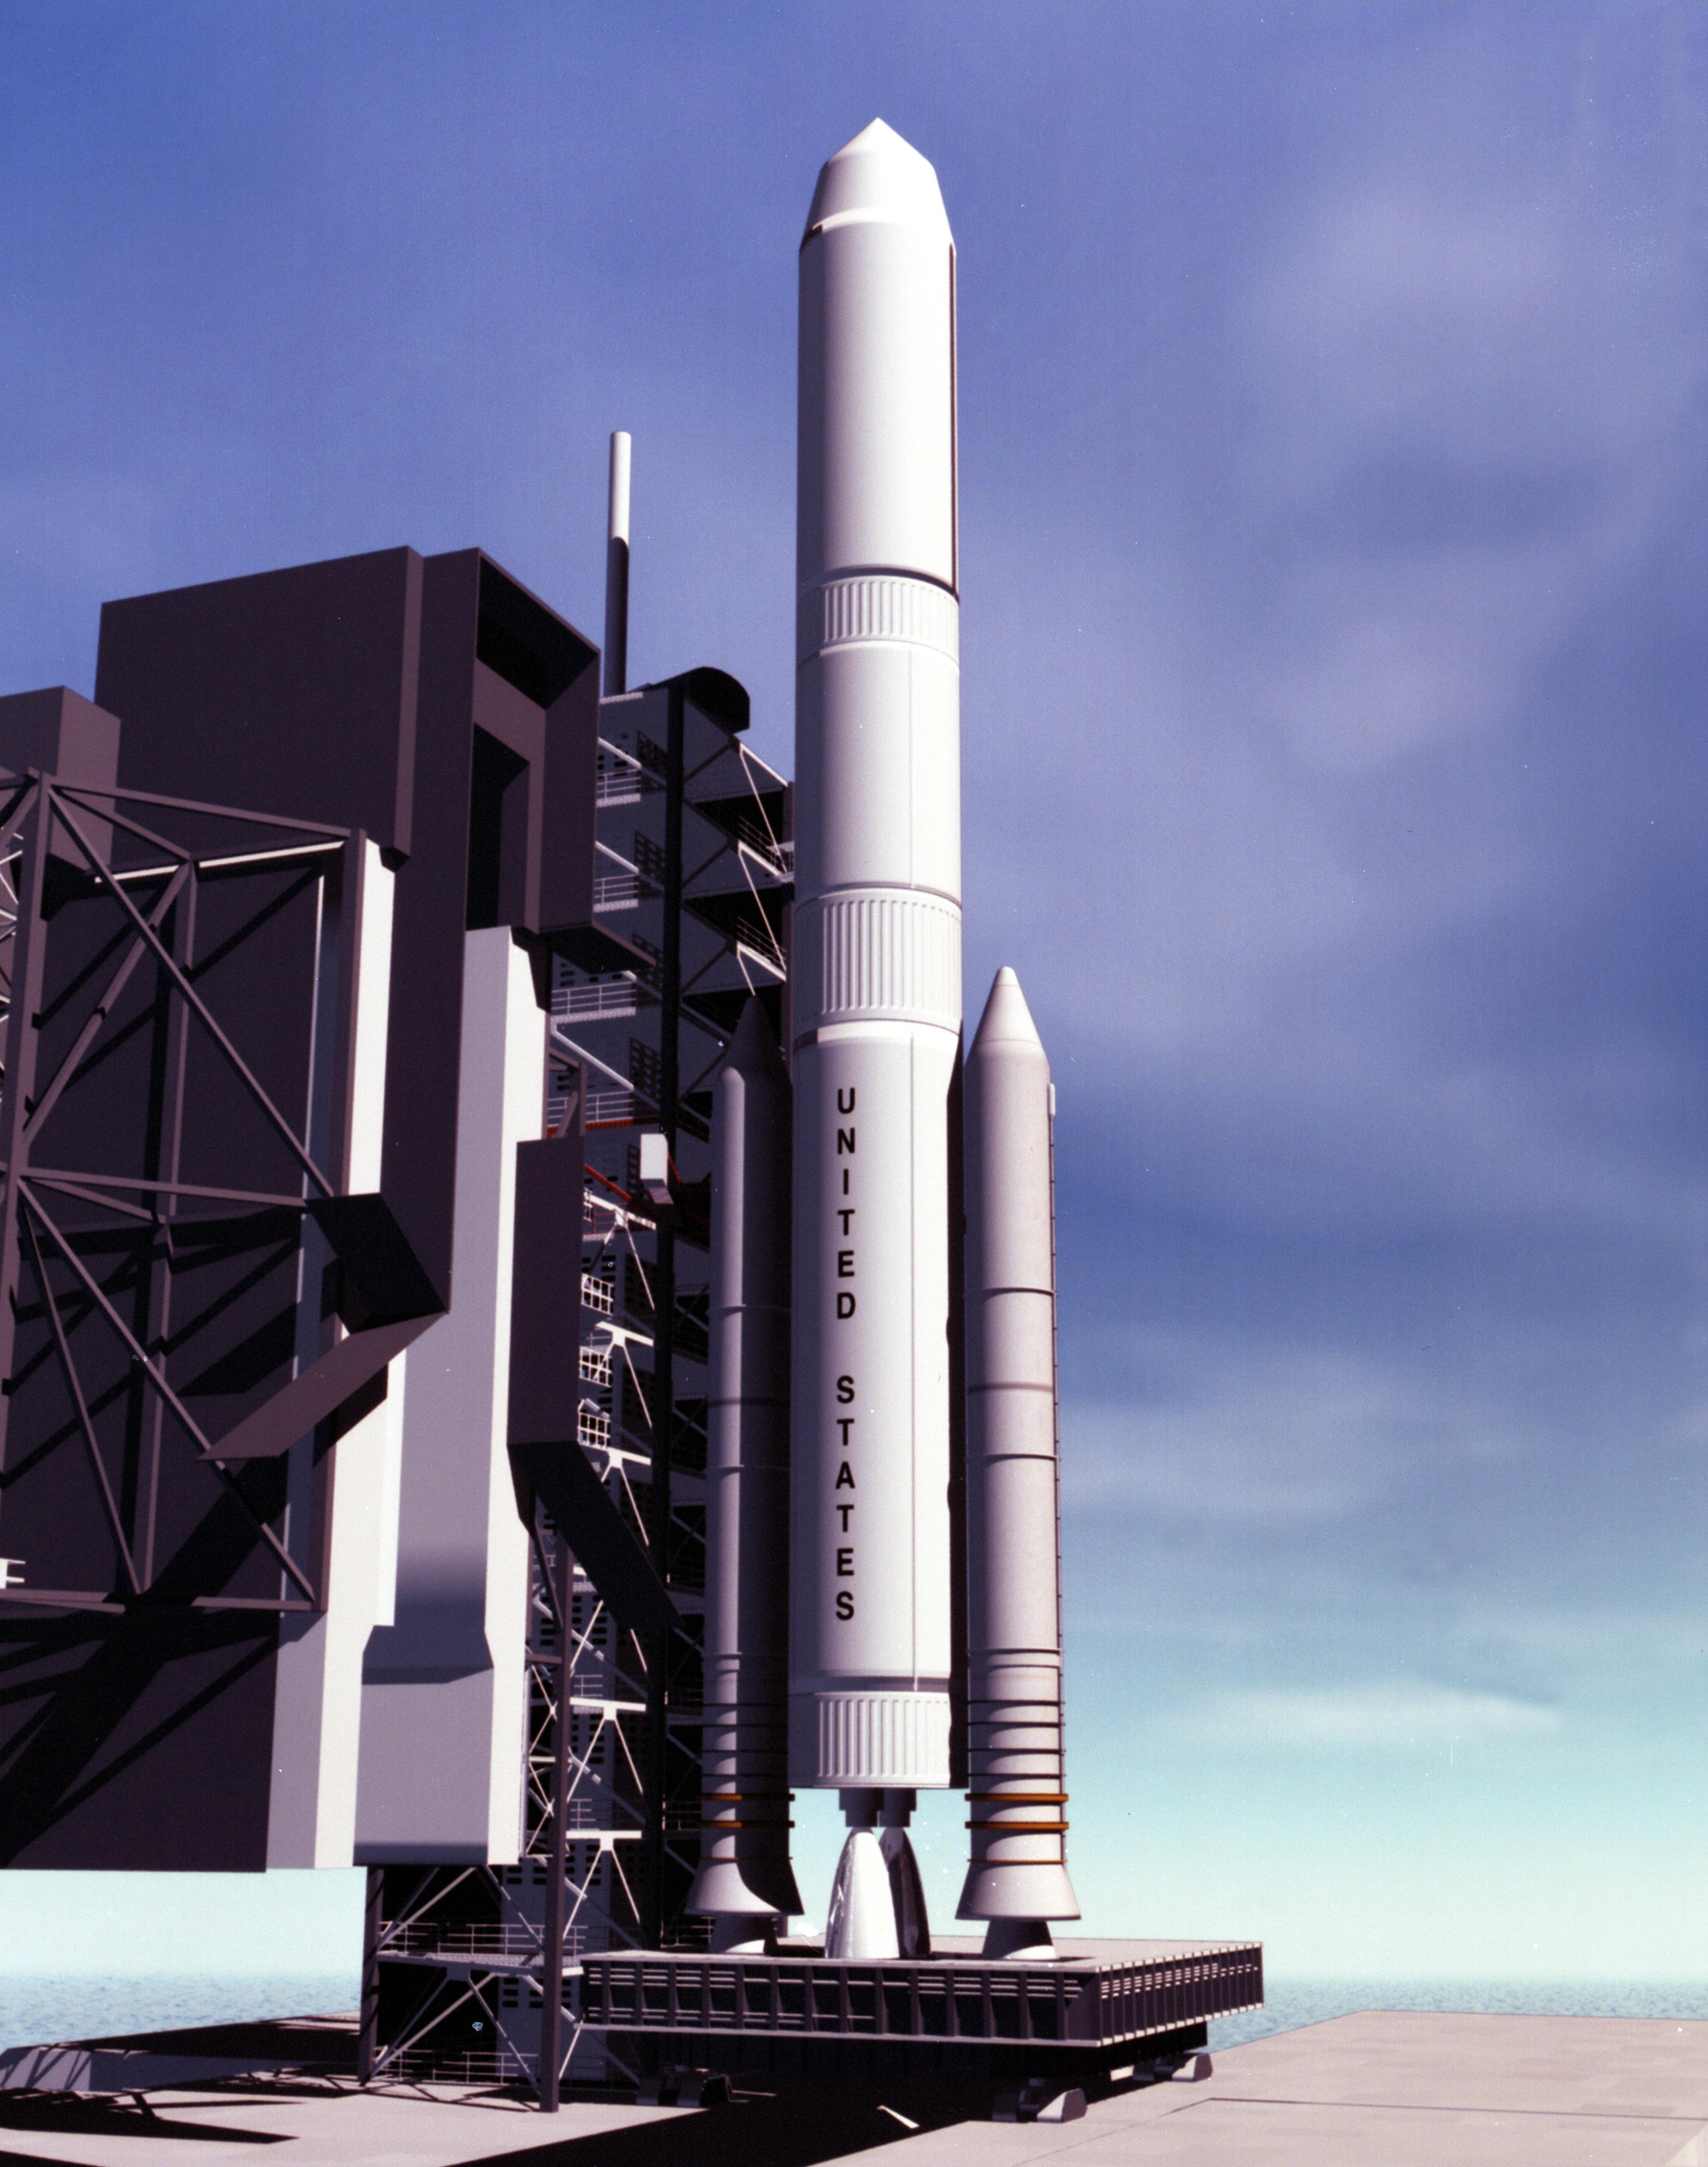 File:Magnum Booster Rocket.jpg - Wikipedia